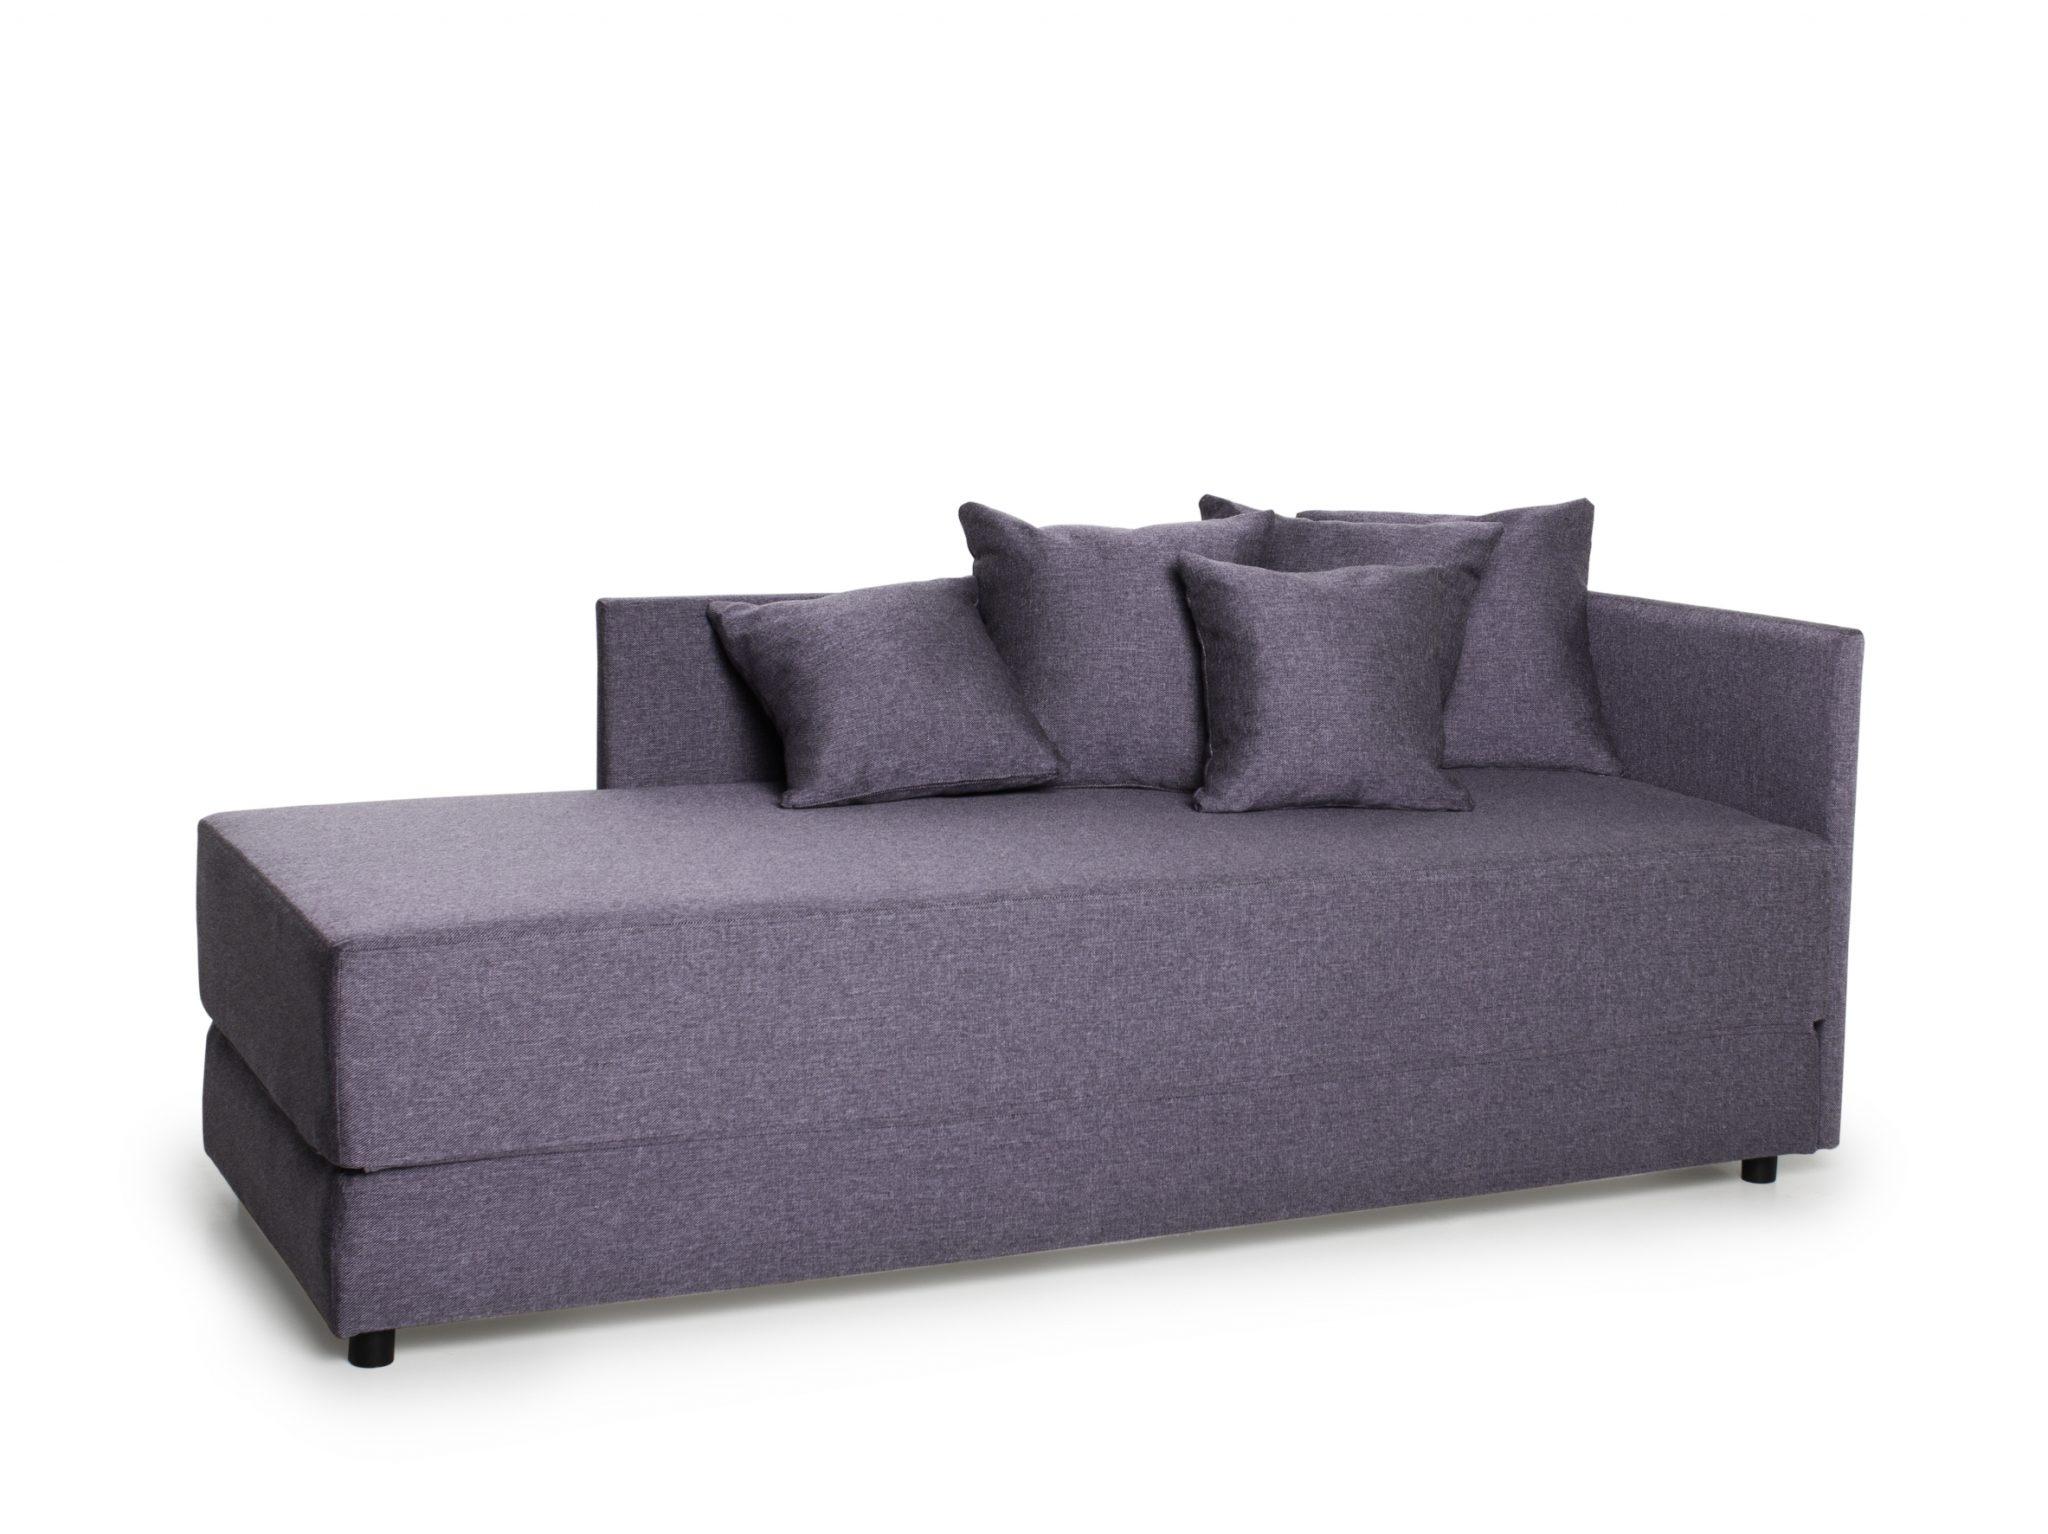 dwr bay sleeper sofa review leather sale singapore sleeping modern sofas room board thesofa